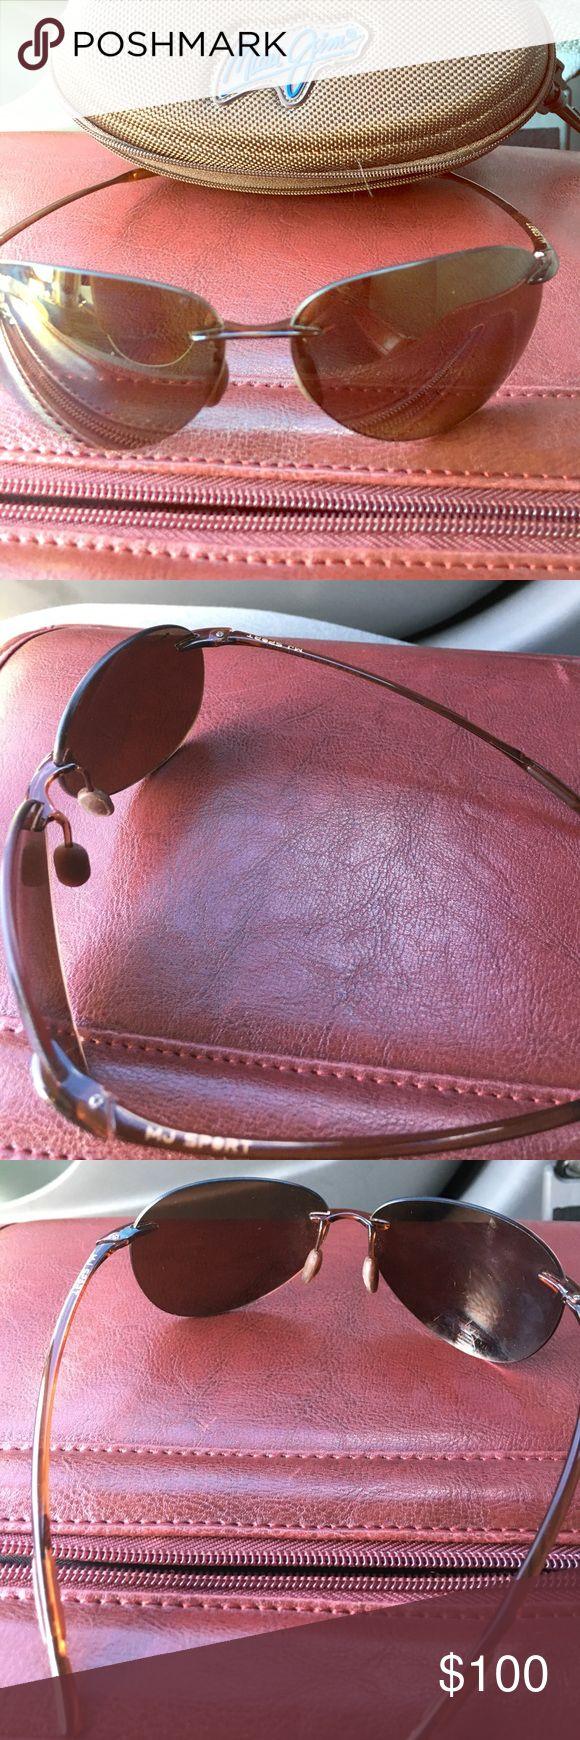 Maui Jim MJ Sport sunglasses Maui Jim MJ Sport polarized sunglasses.  Great condition.  Barely worn.  Not my style.  Best offer Maui Jim Accessories Sunglasses